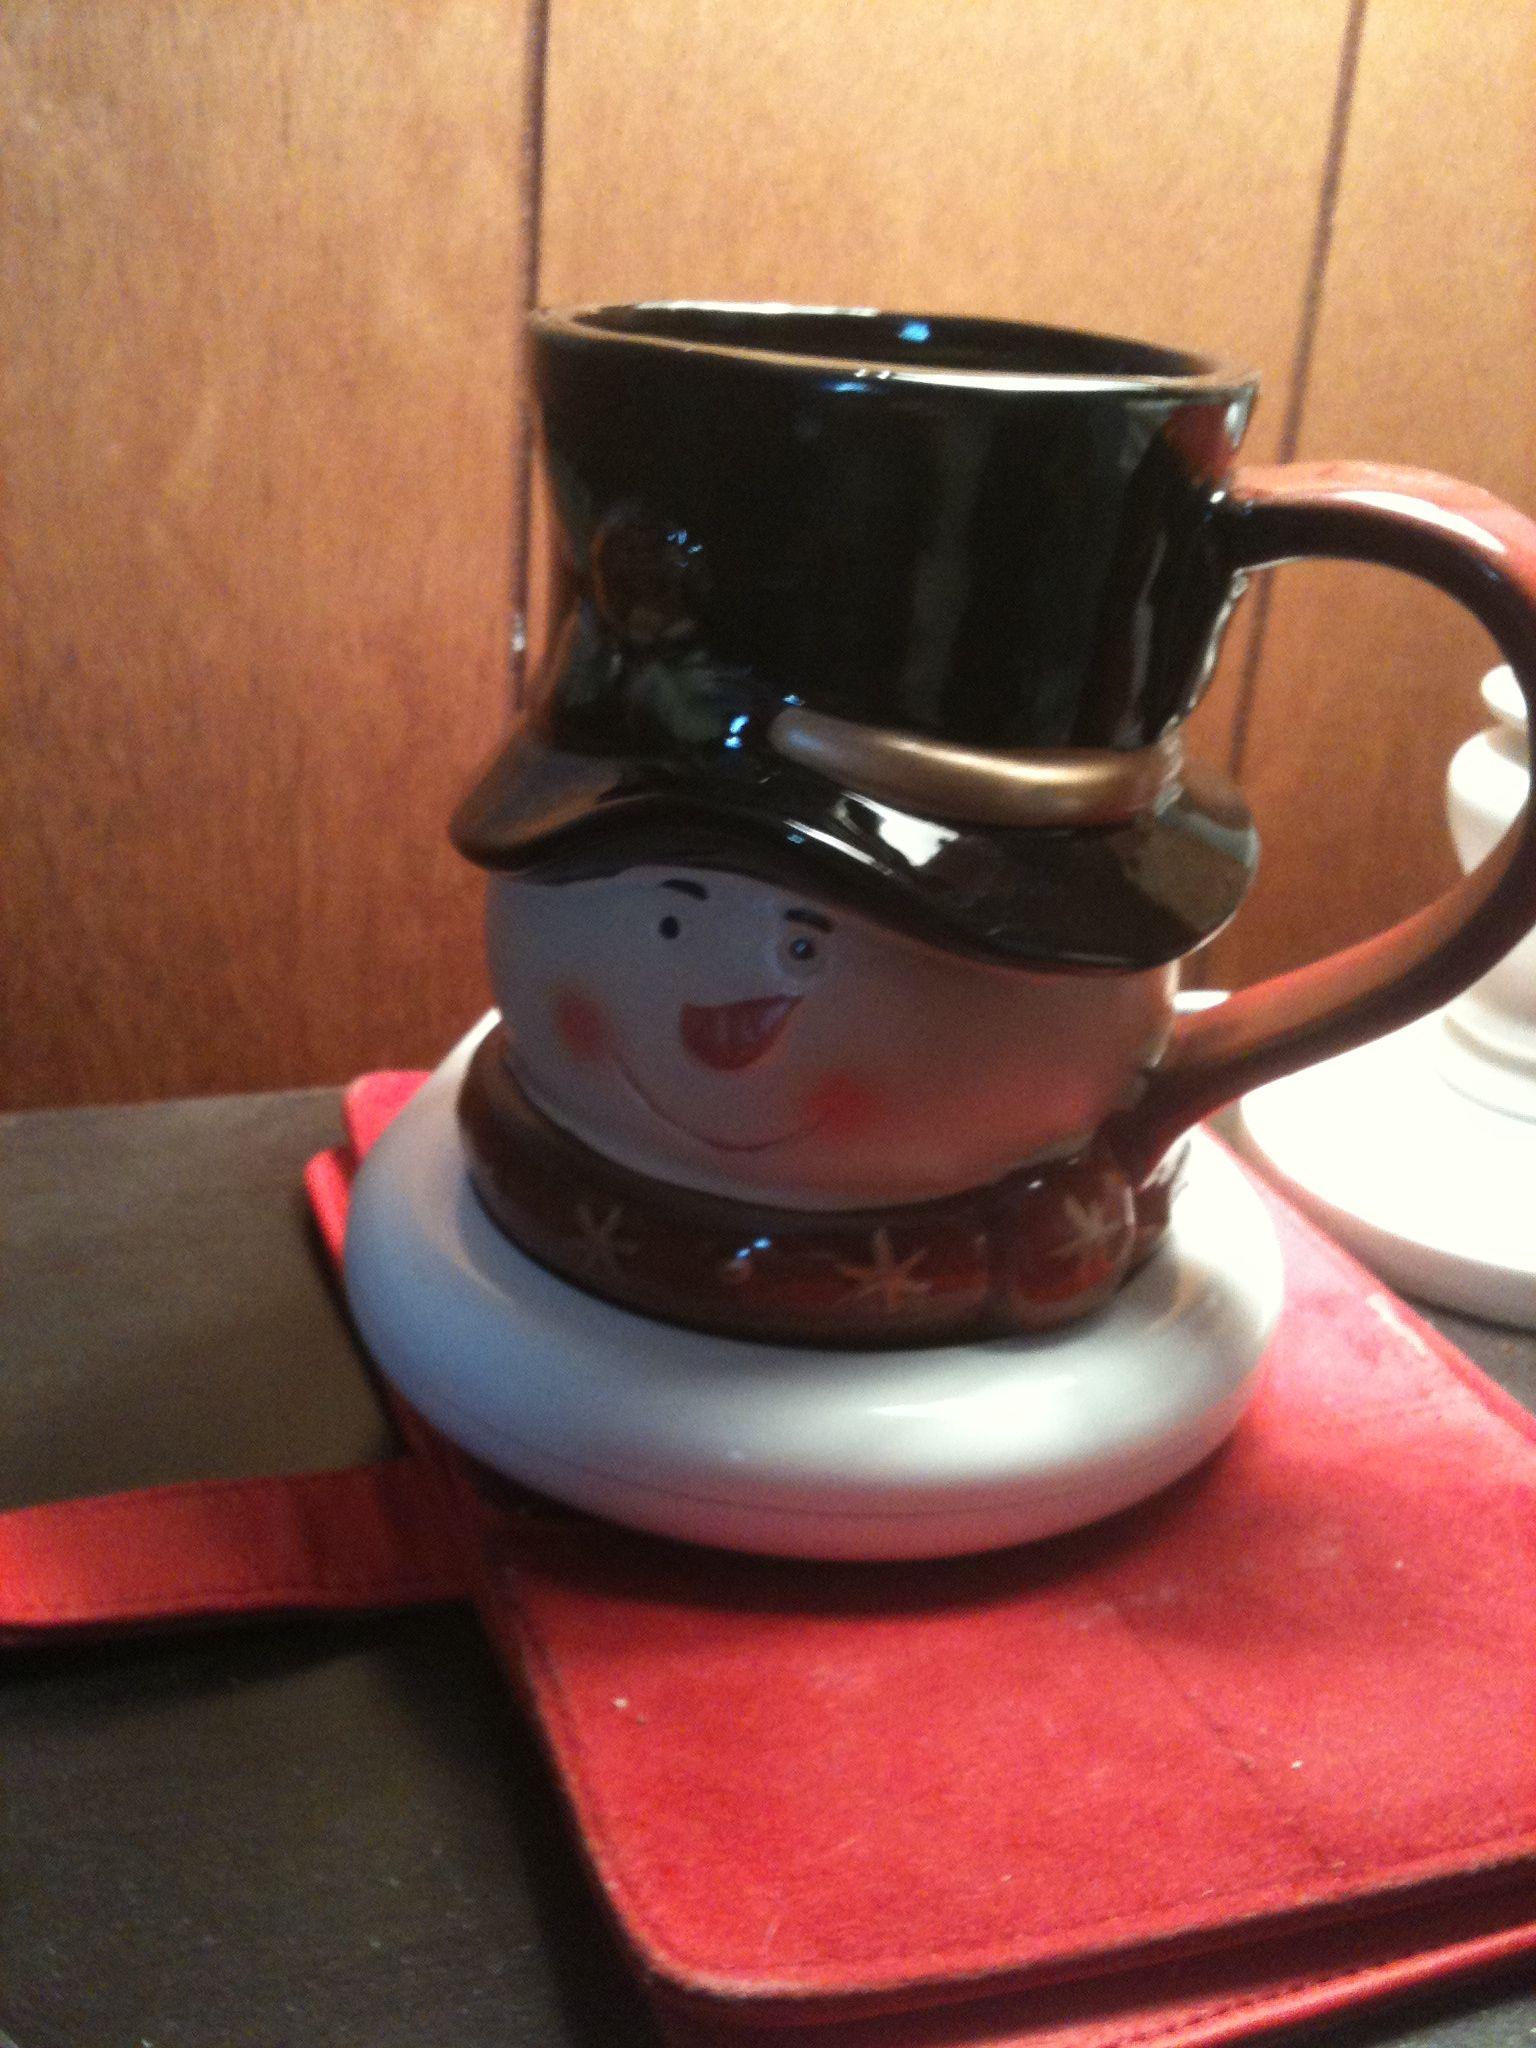 Use a candle warmer to keep your coffee warm! Sometimes i